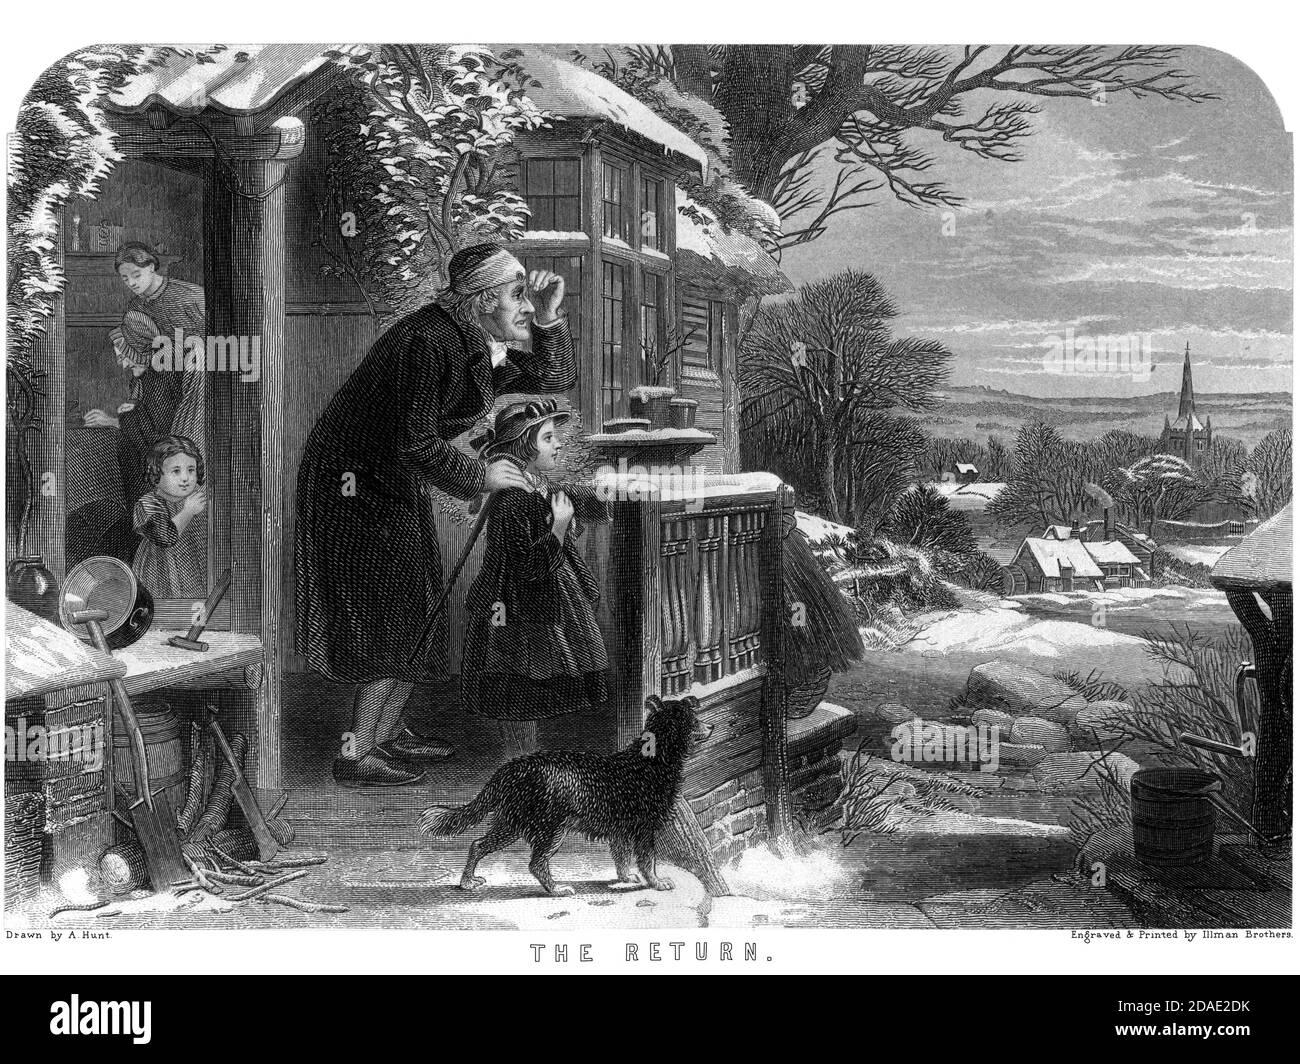 The Return Artwork from Godey's Lady's Book and Magazine, December 1864, Volume LXIX, (Volume 69), Philadelphia, Louis A. Godey, Sarah Josepha Hale, Stock Photo